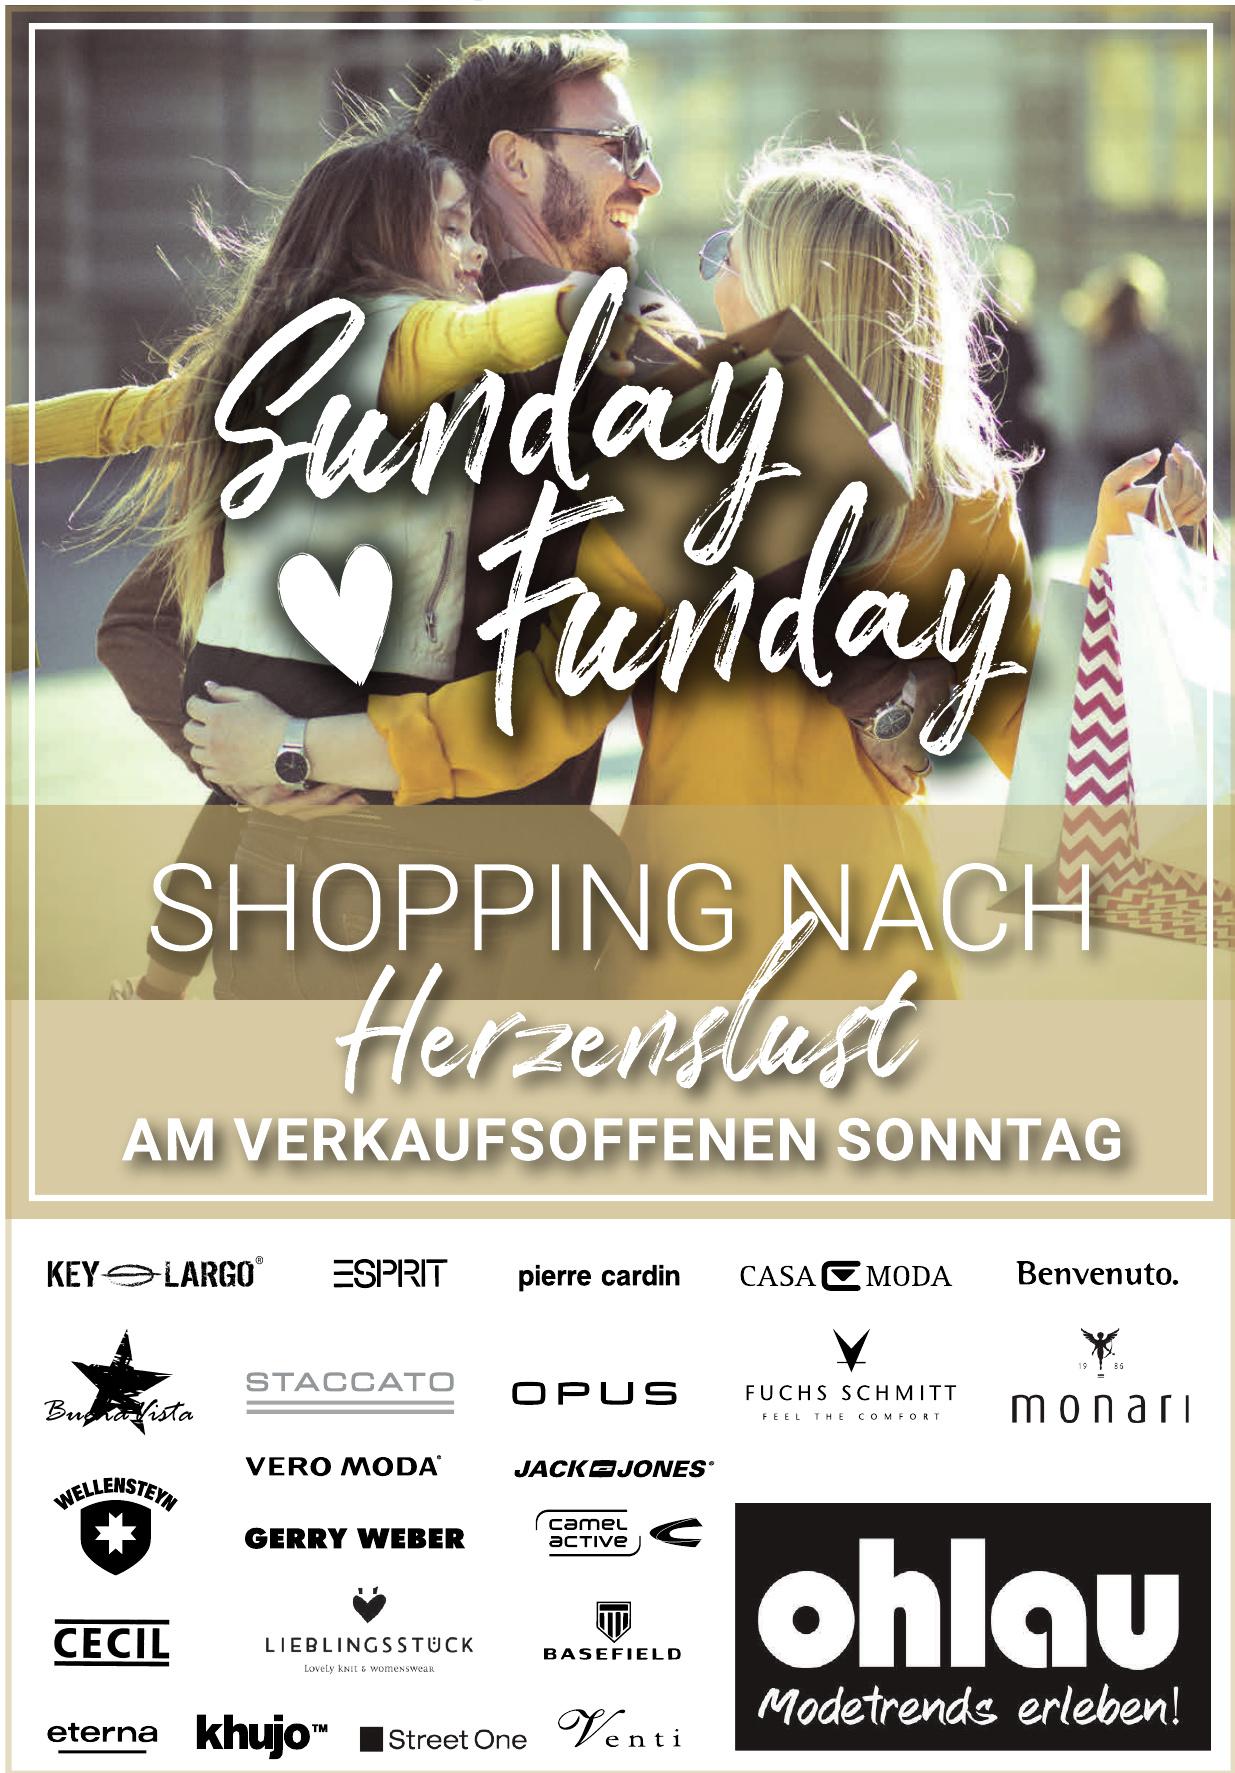 Sunday Funday - Shoping nach Herzenlust am Verkaufsoffenen Sonntag